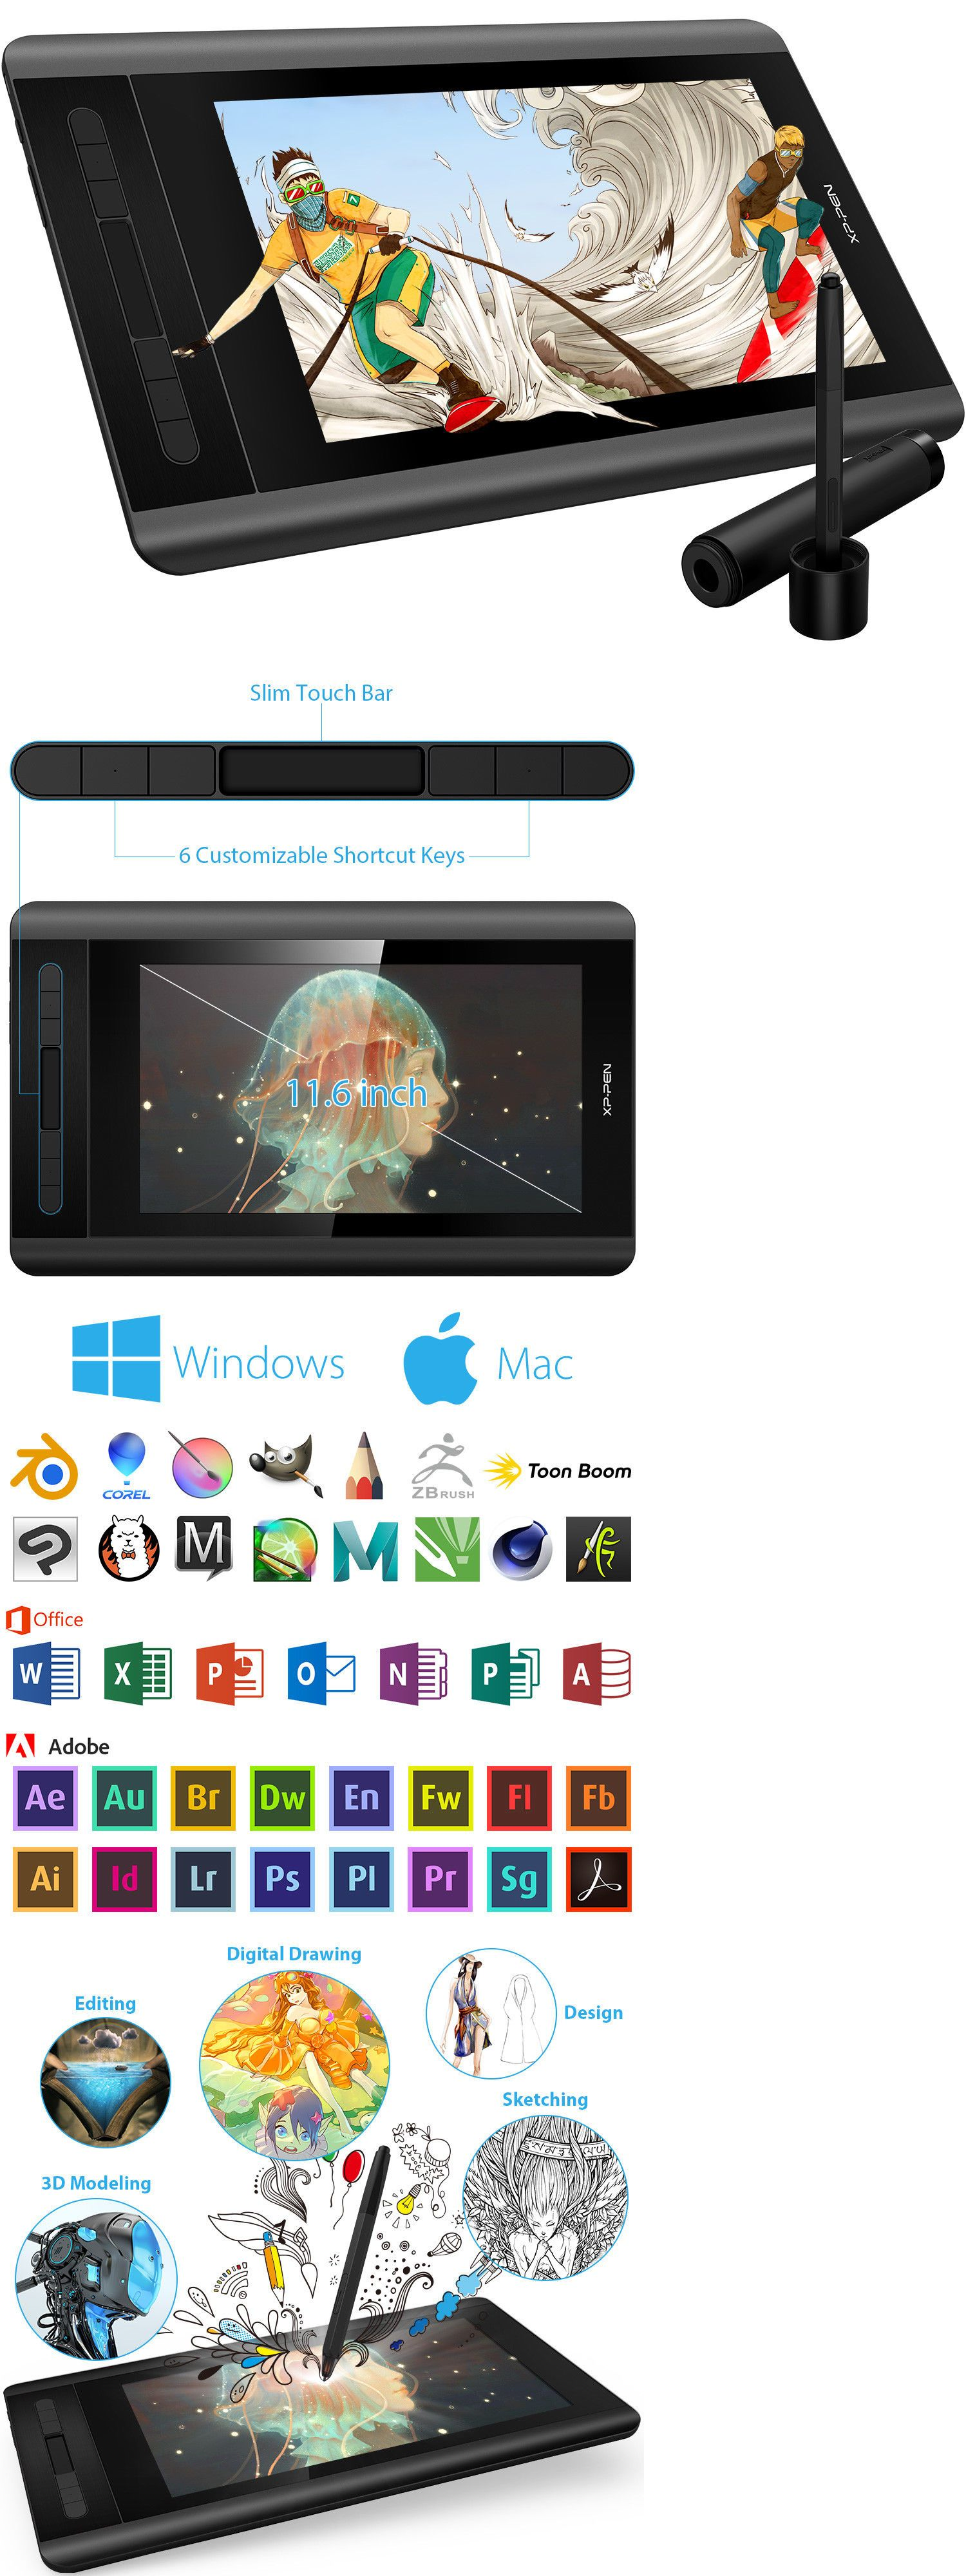 Xp Pen Artist12 11 6 Hd Drawing Pen Tablet Ips Graphics Tablet Monitor 8192 Digital Drawing Tablet Pen Tablet Drawing Tablet